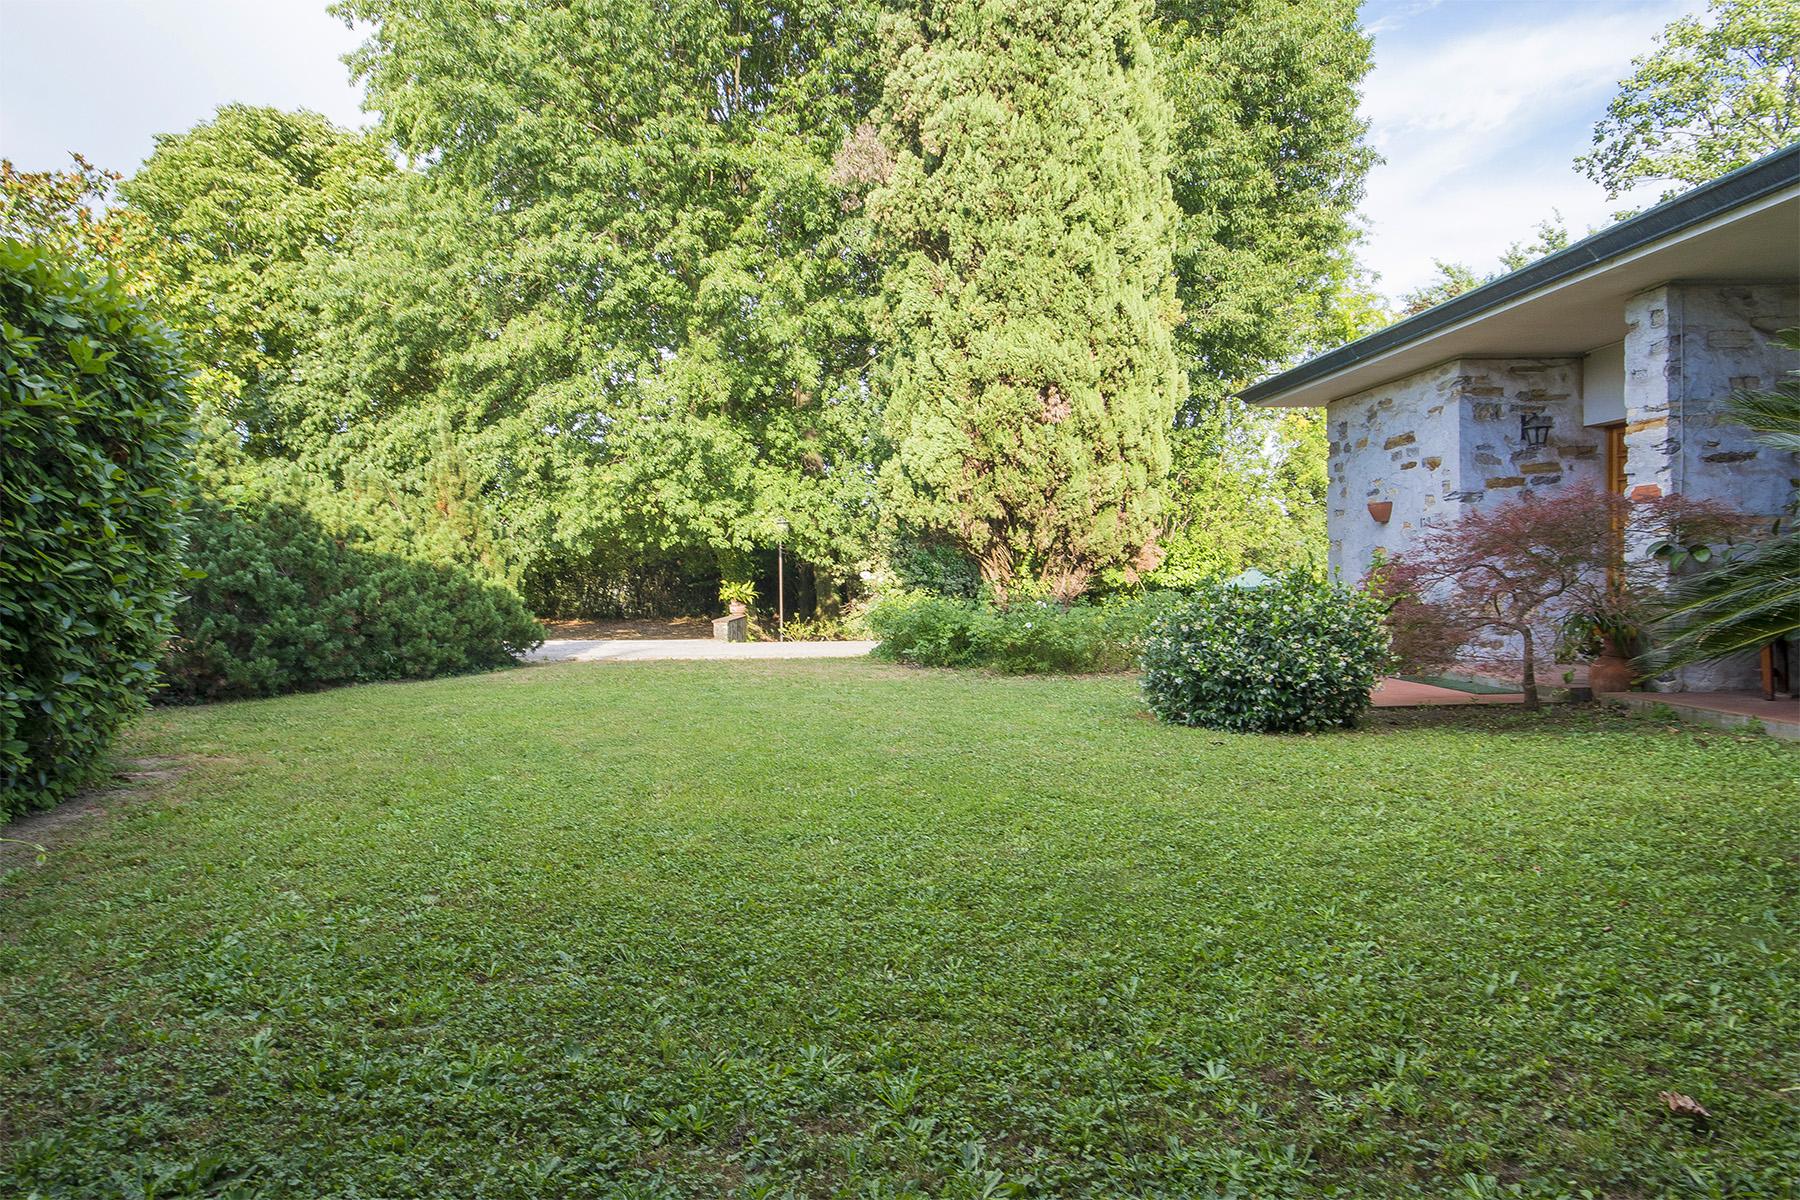 Villa in Vendita a Capannori: 5 locali, 500 mq - Foto 19